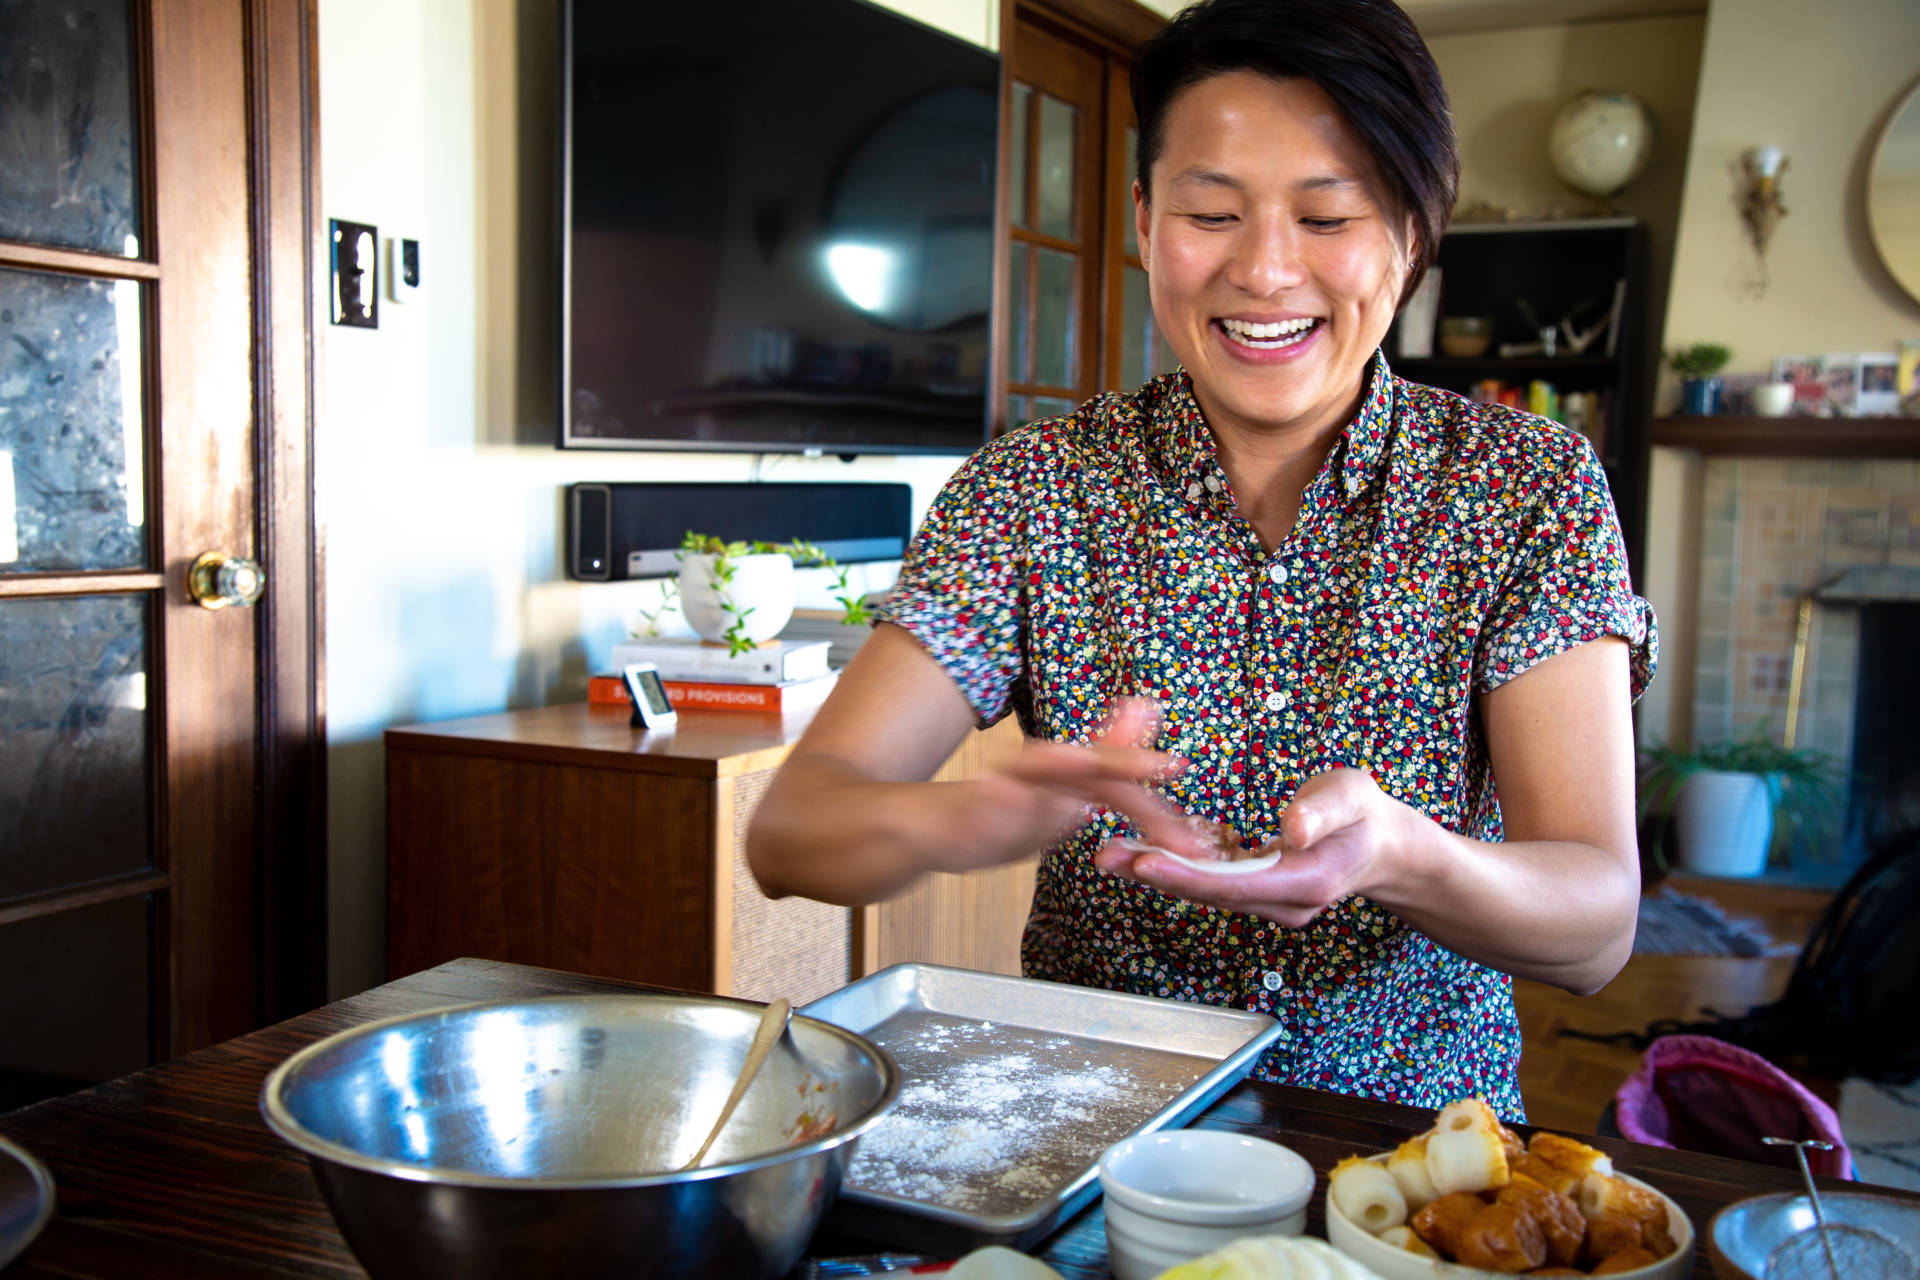 Melissa prepares dumplings for her upcoming hot pot party.